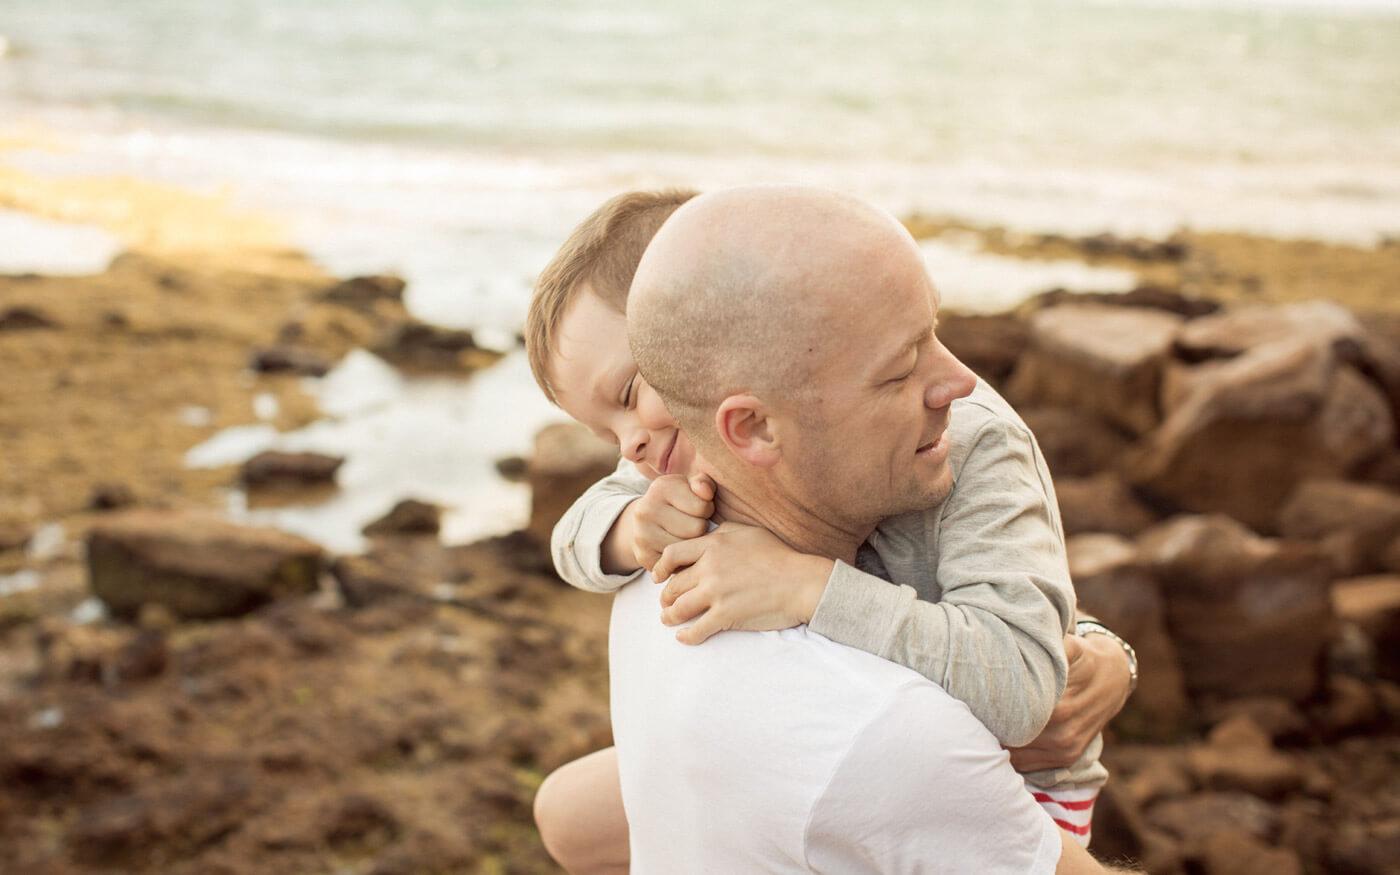 sarah-churcher-lifestlye-family-photography-bayside-beaumaris-beach